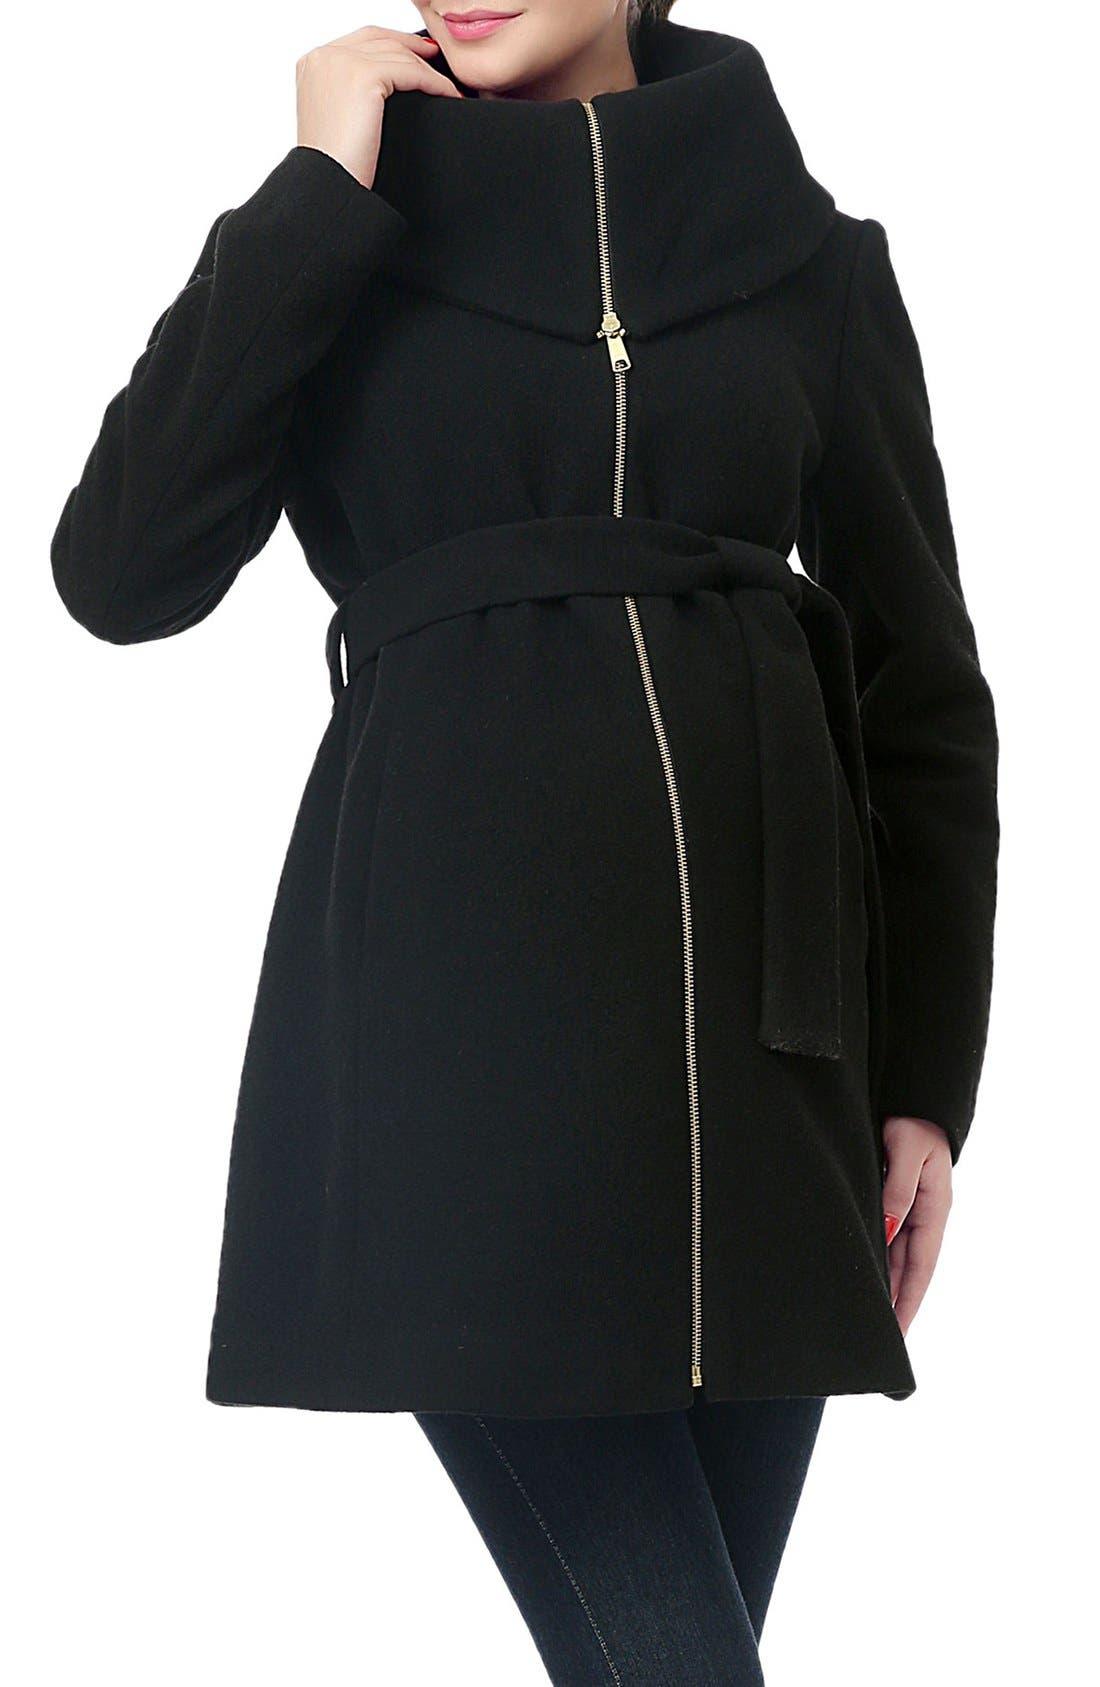 'Mia' High Collar Maternity Coat,                         Main,                         color, BLACK